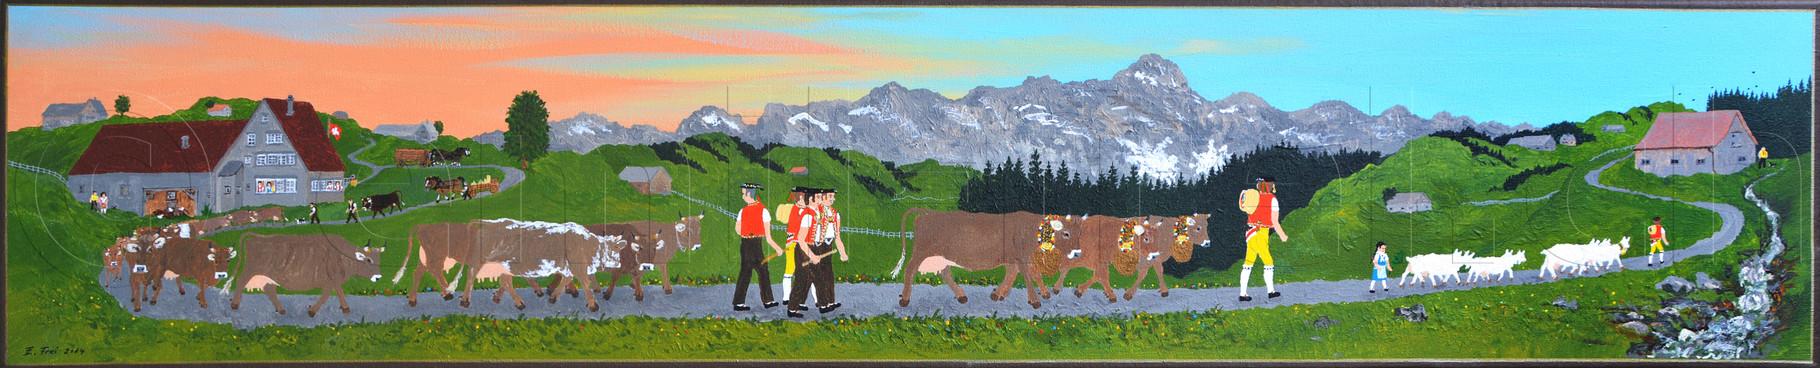 20 x 100 cm, Acryl auf Leinwand, 2014